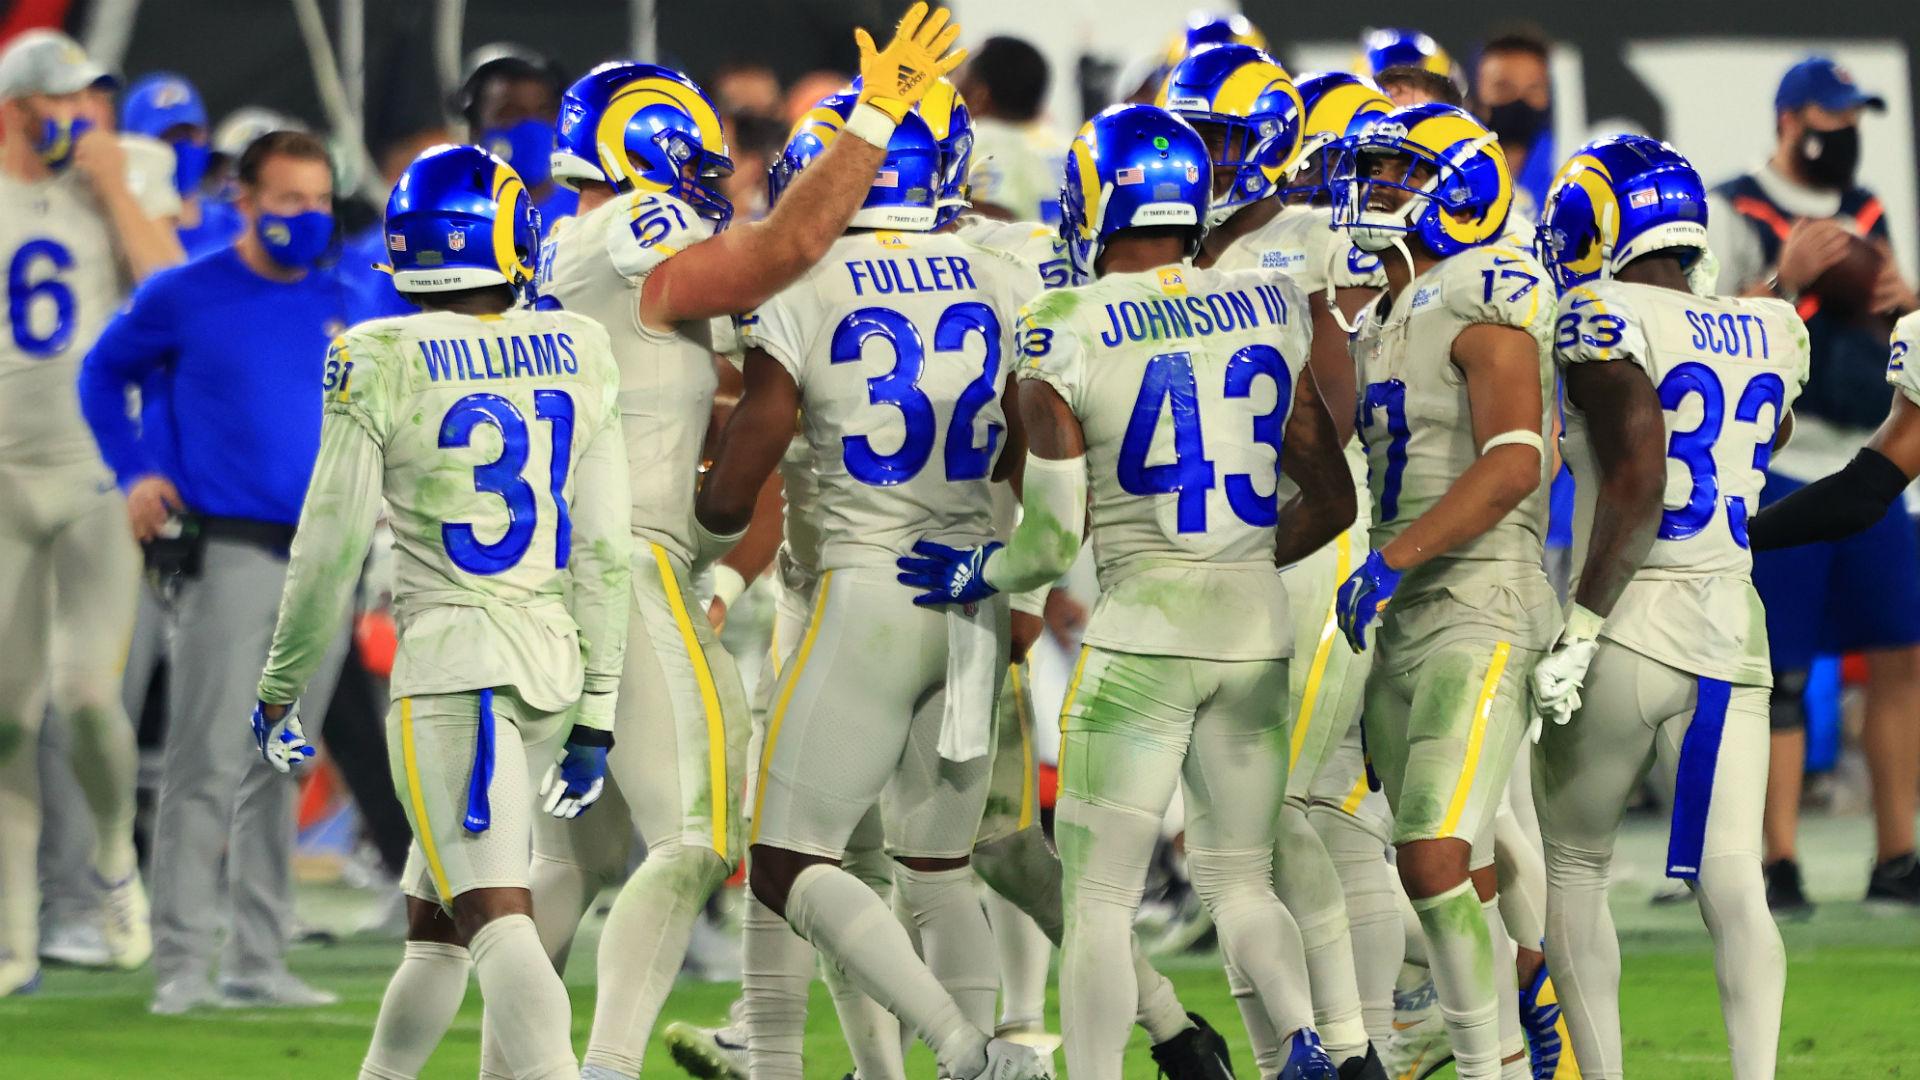 Rams vs. Buccaneers score, results: LA defense shuts down Tom Brady in the second half 1